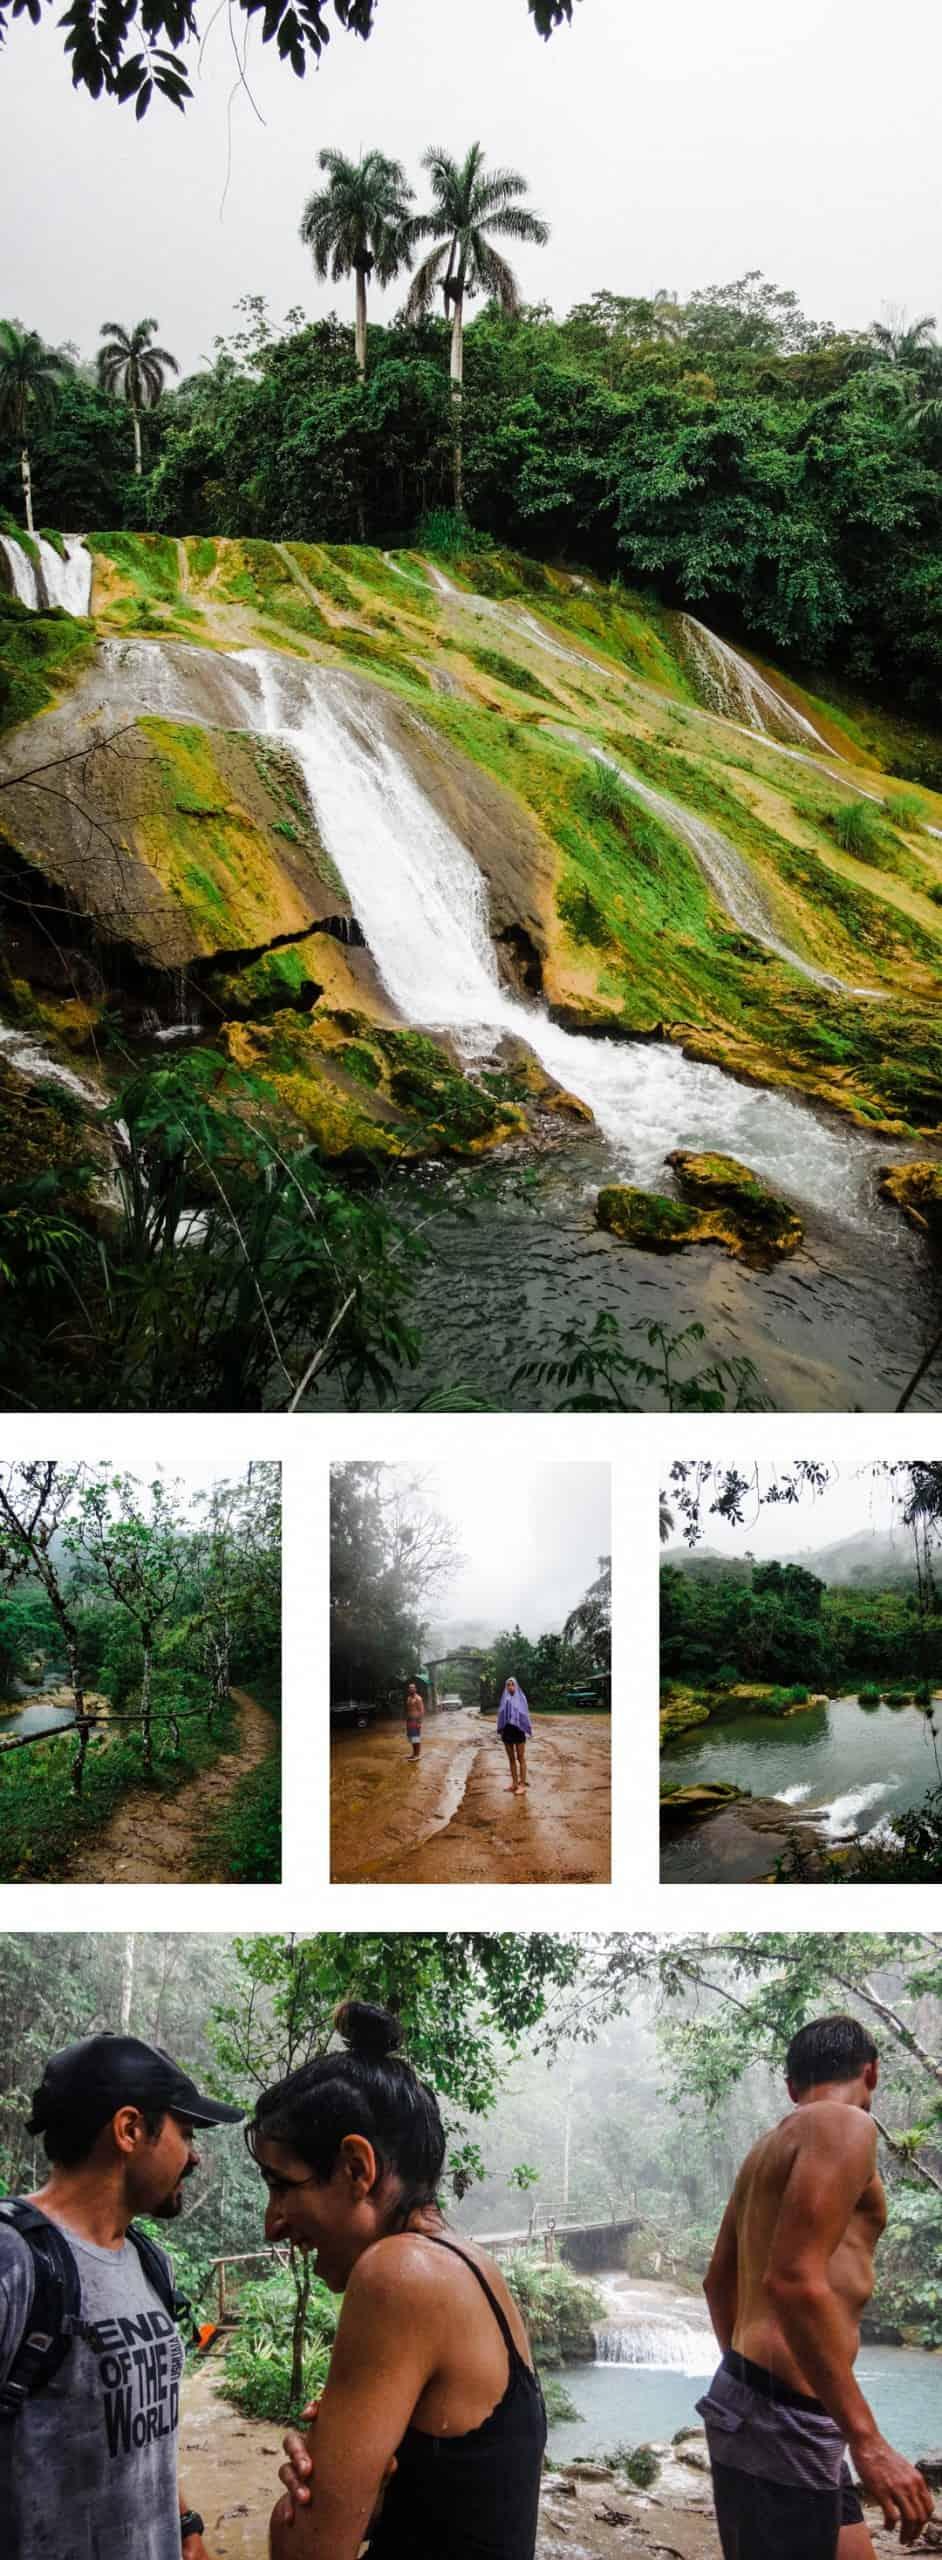 Cuba national park and waterfalls